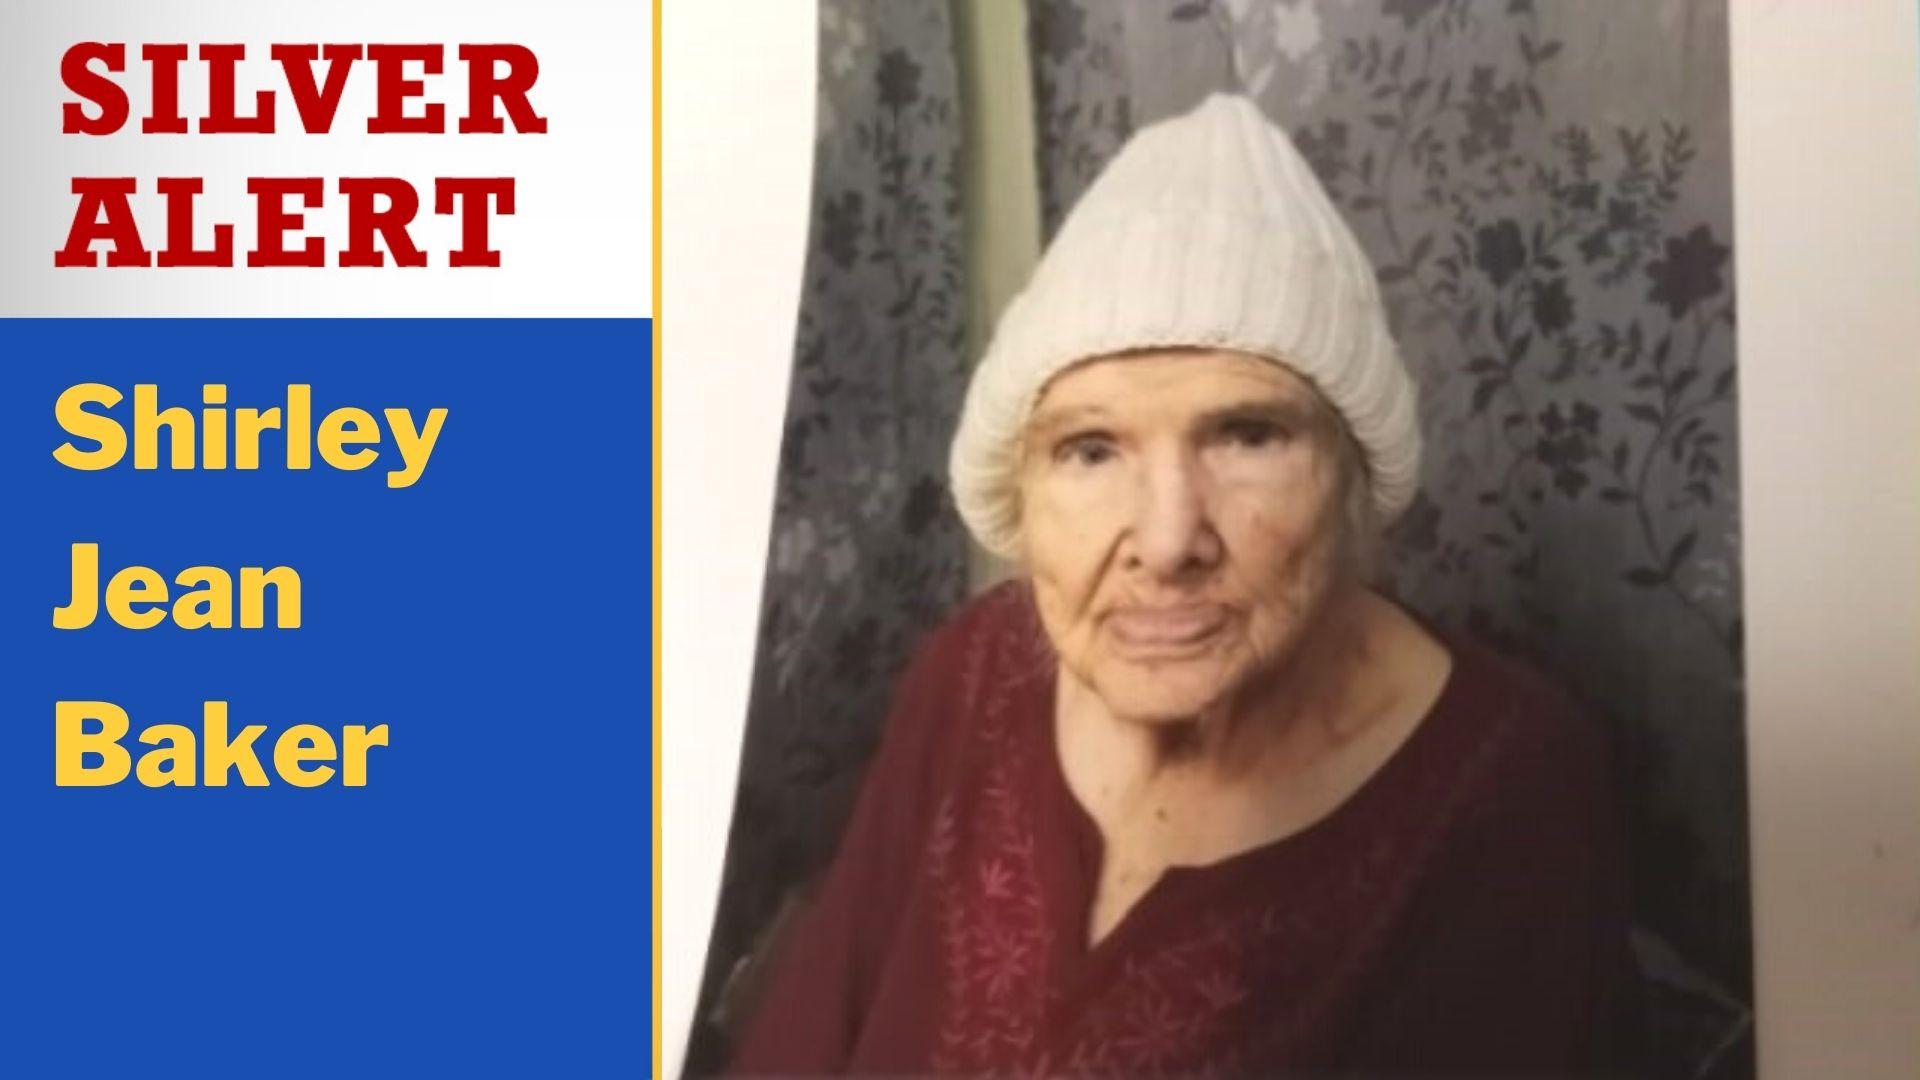 Silver Alert: Shirley Jean Baker